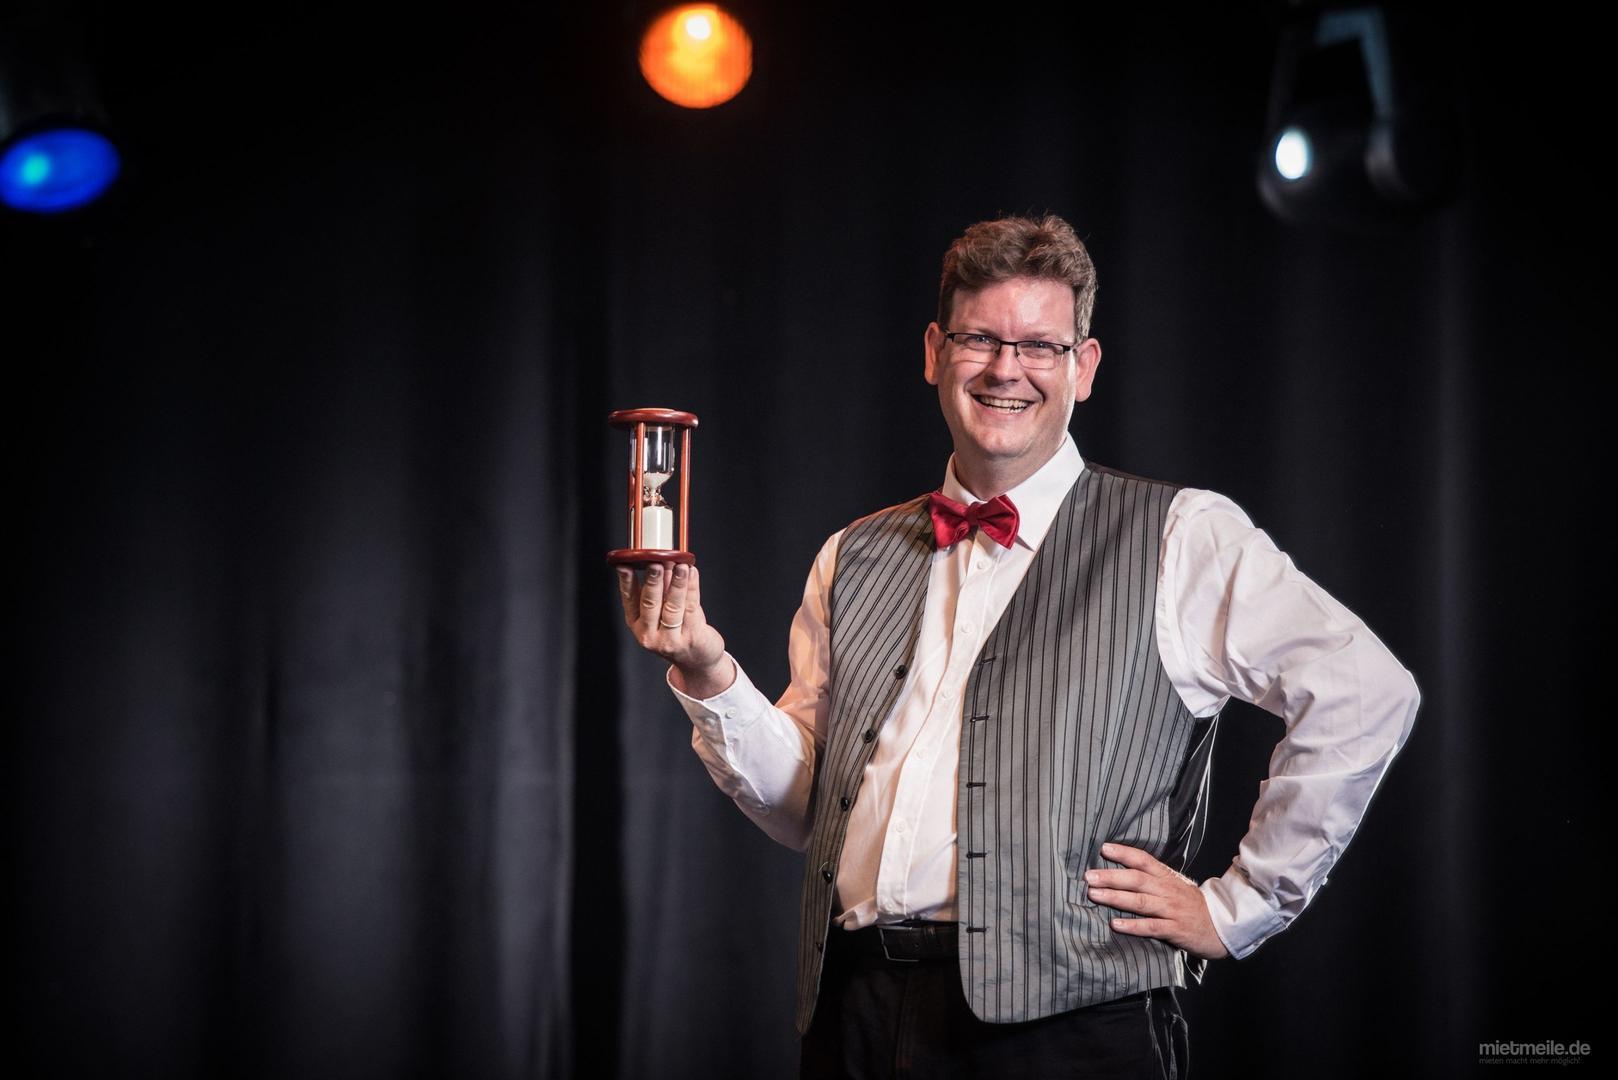 Magier & Zauberer mieten & vermieten - Zauberkünstler Benji Wiebe - Bezauberhaft! in Linkenheim-Hochstetten